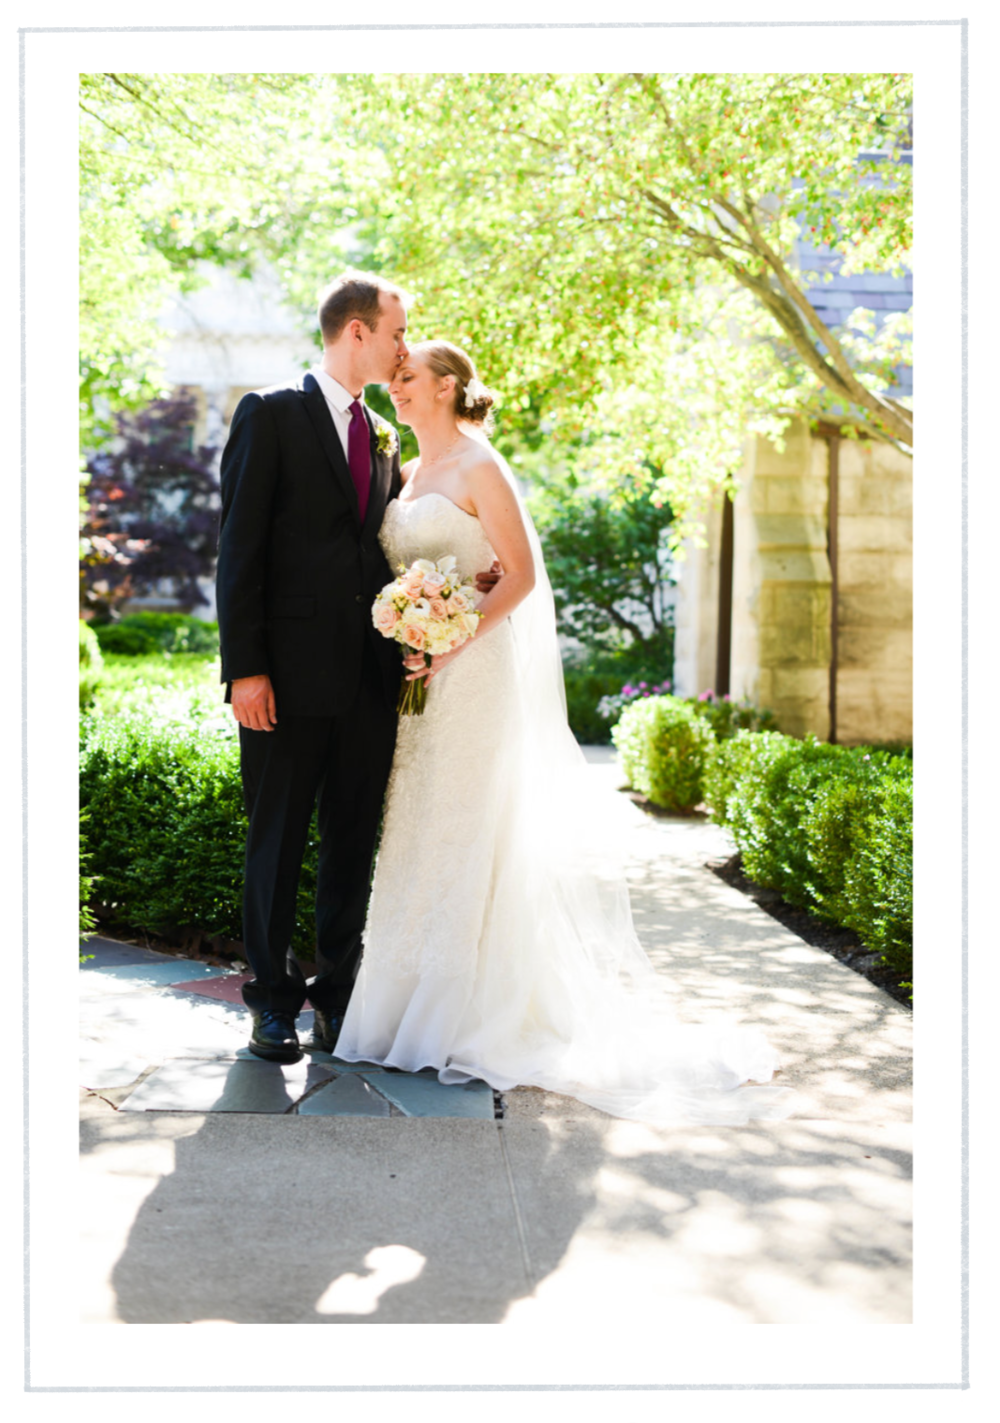 New England Wedding Lifestyle PhotographerMassachusetts Wedding Lifestyle Photographer